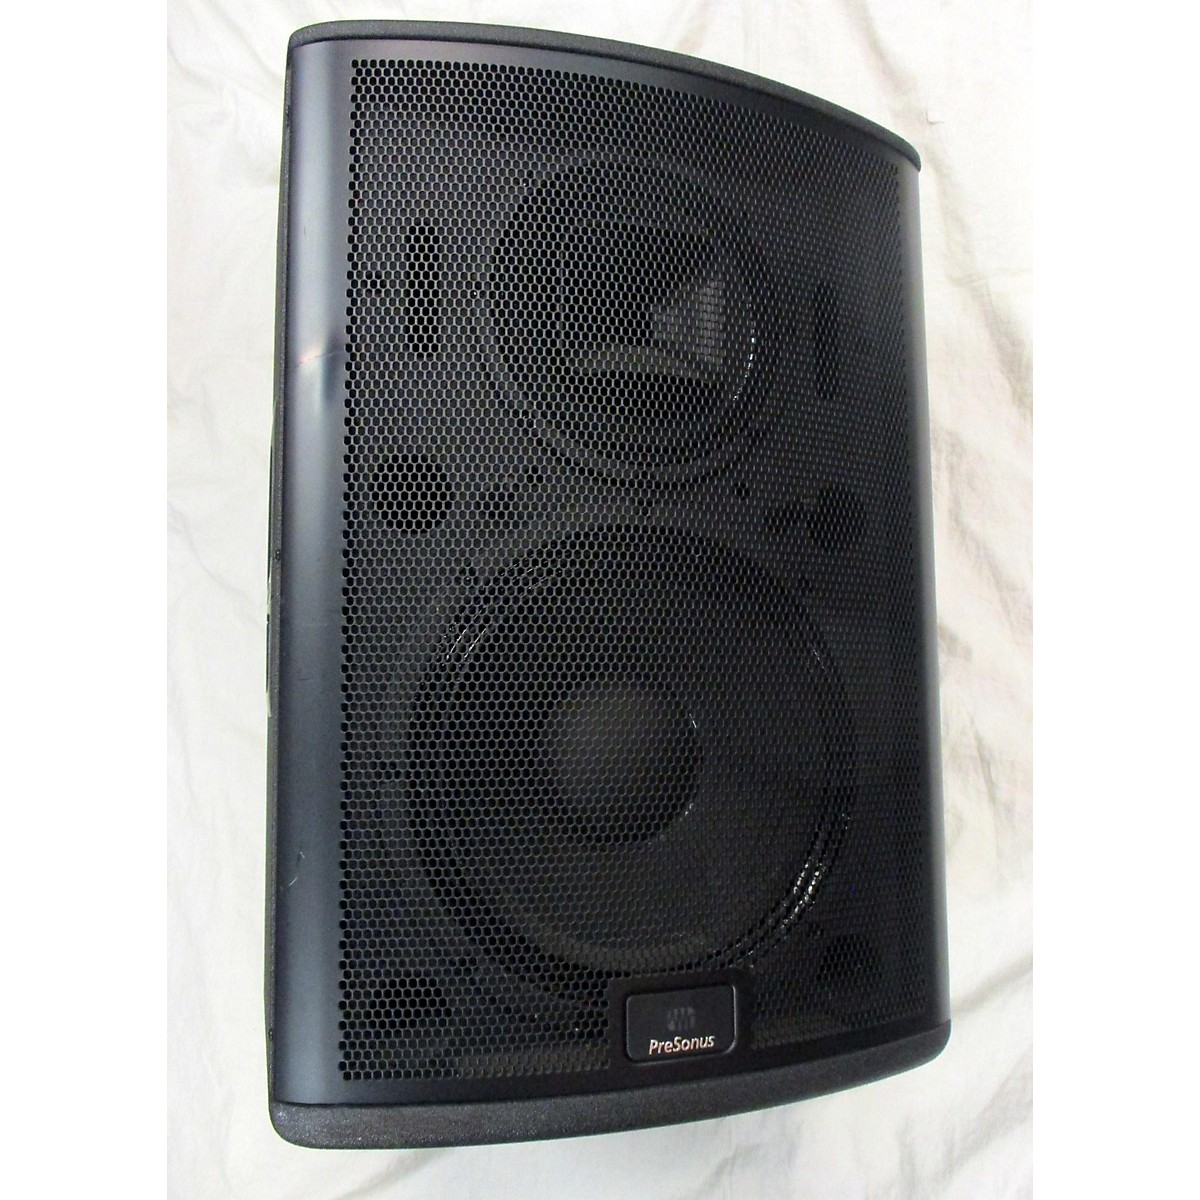 Presonus STUDIOLIVE 312 AI Powered Speaker